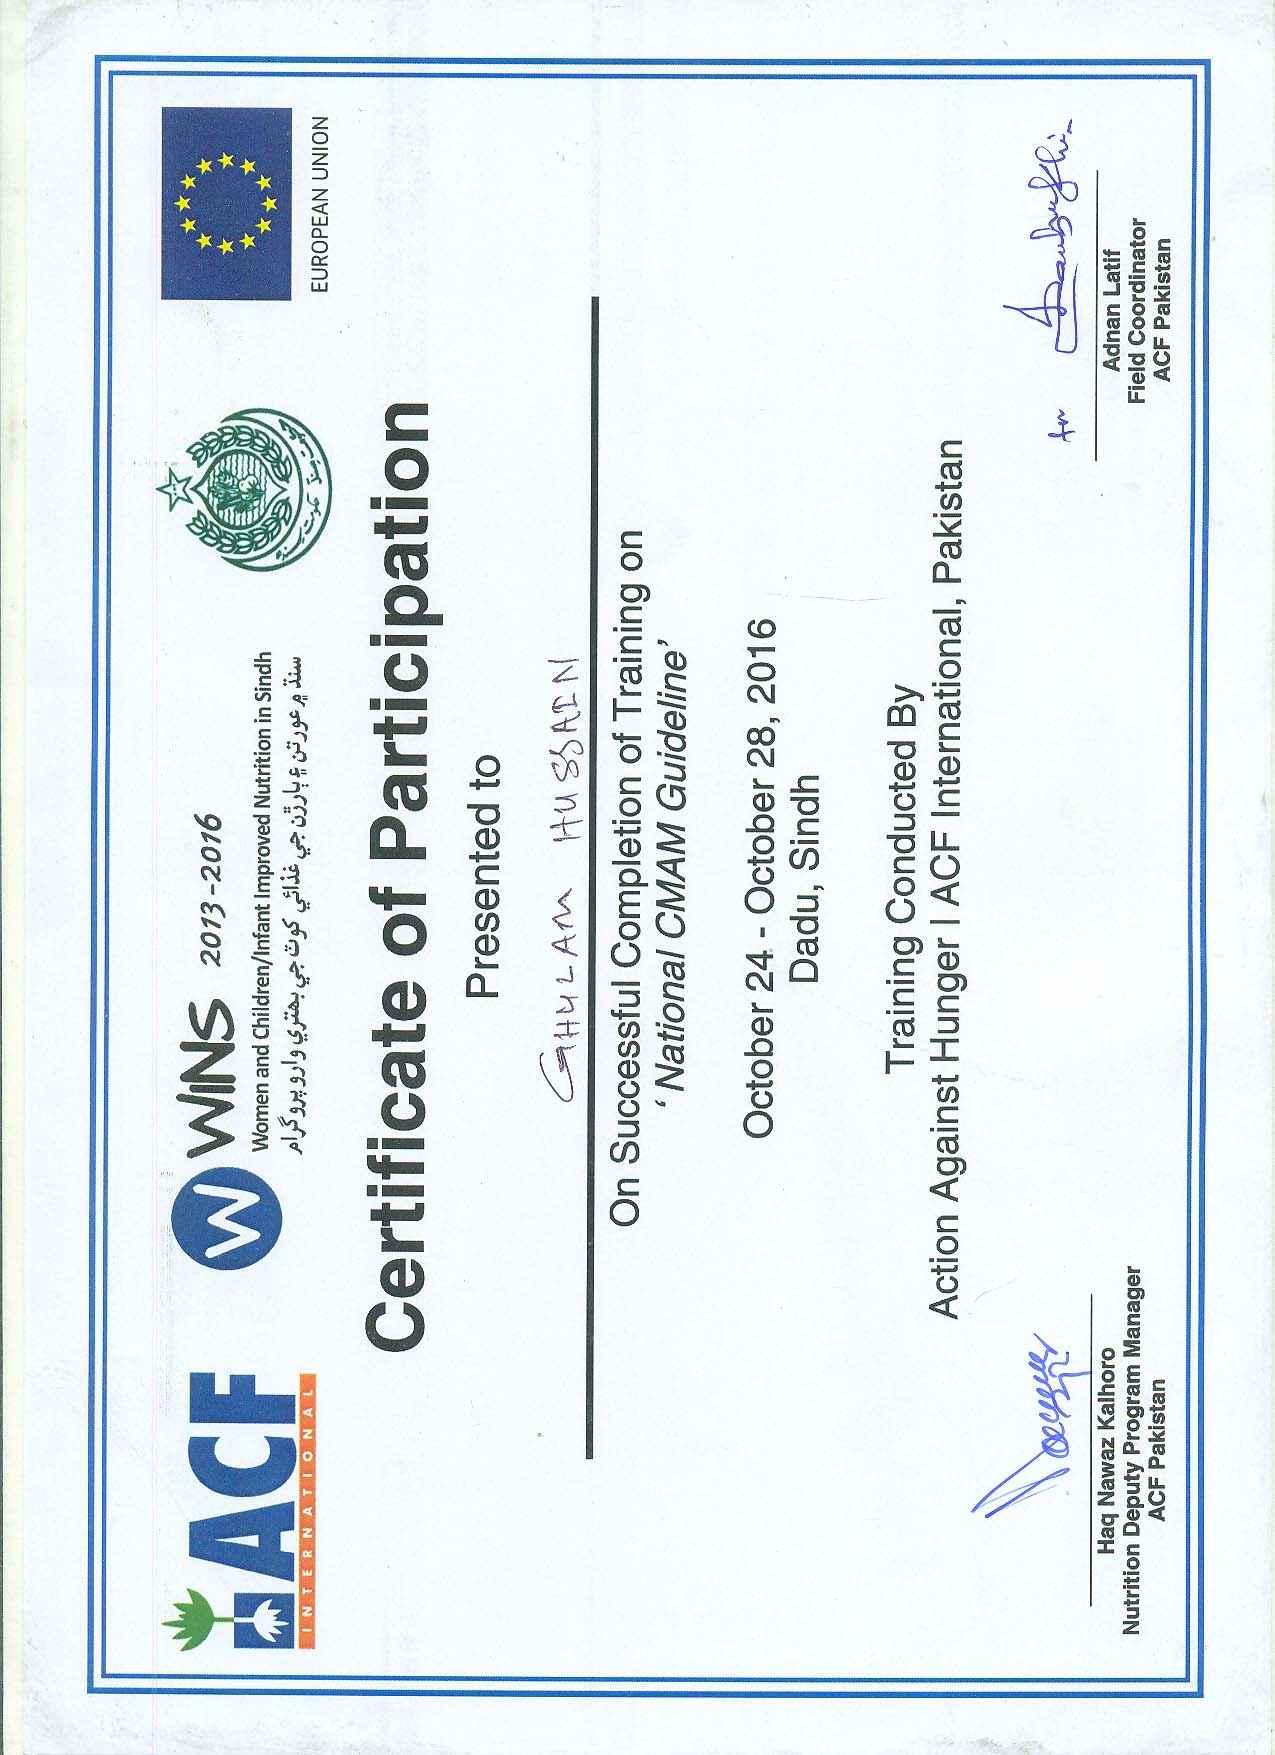 Nutrition Certificate Programs Best Design Sertificate 2018